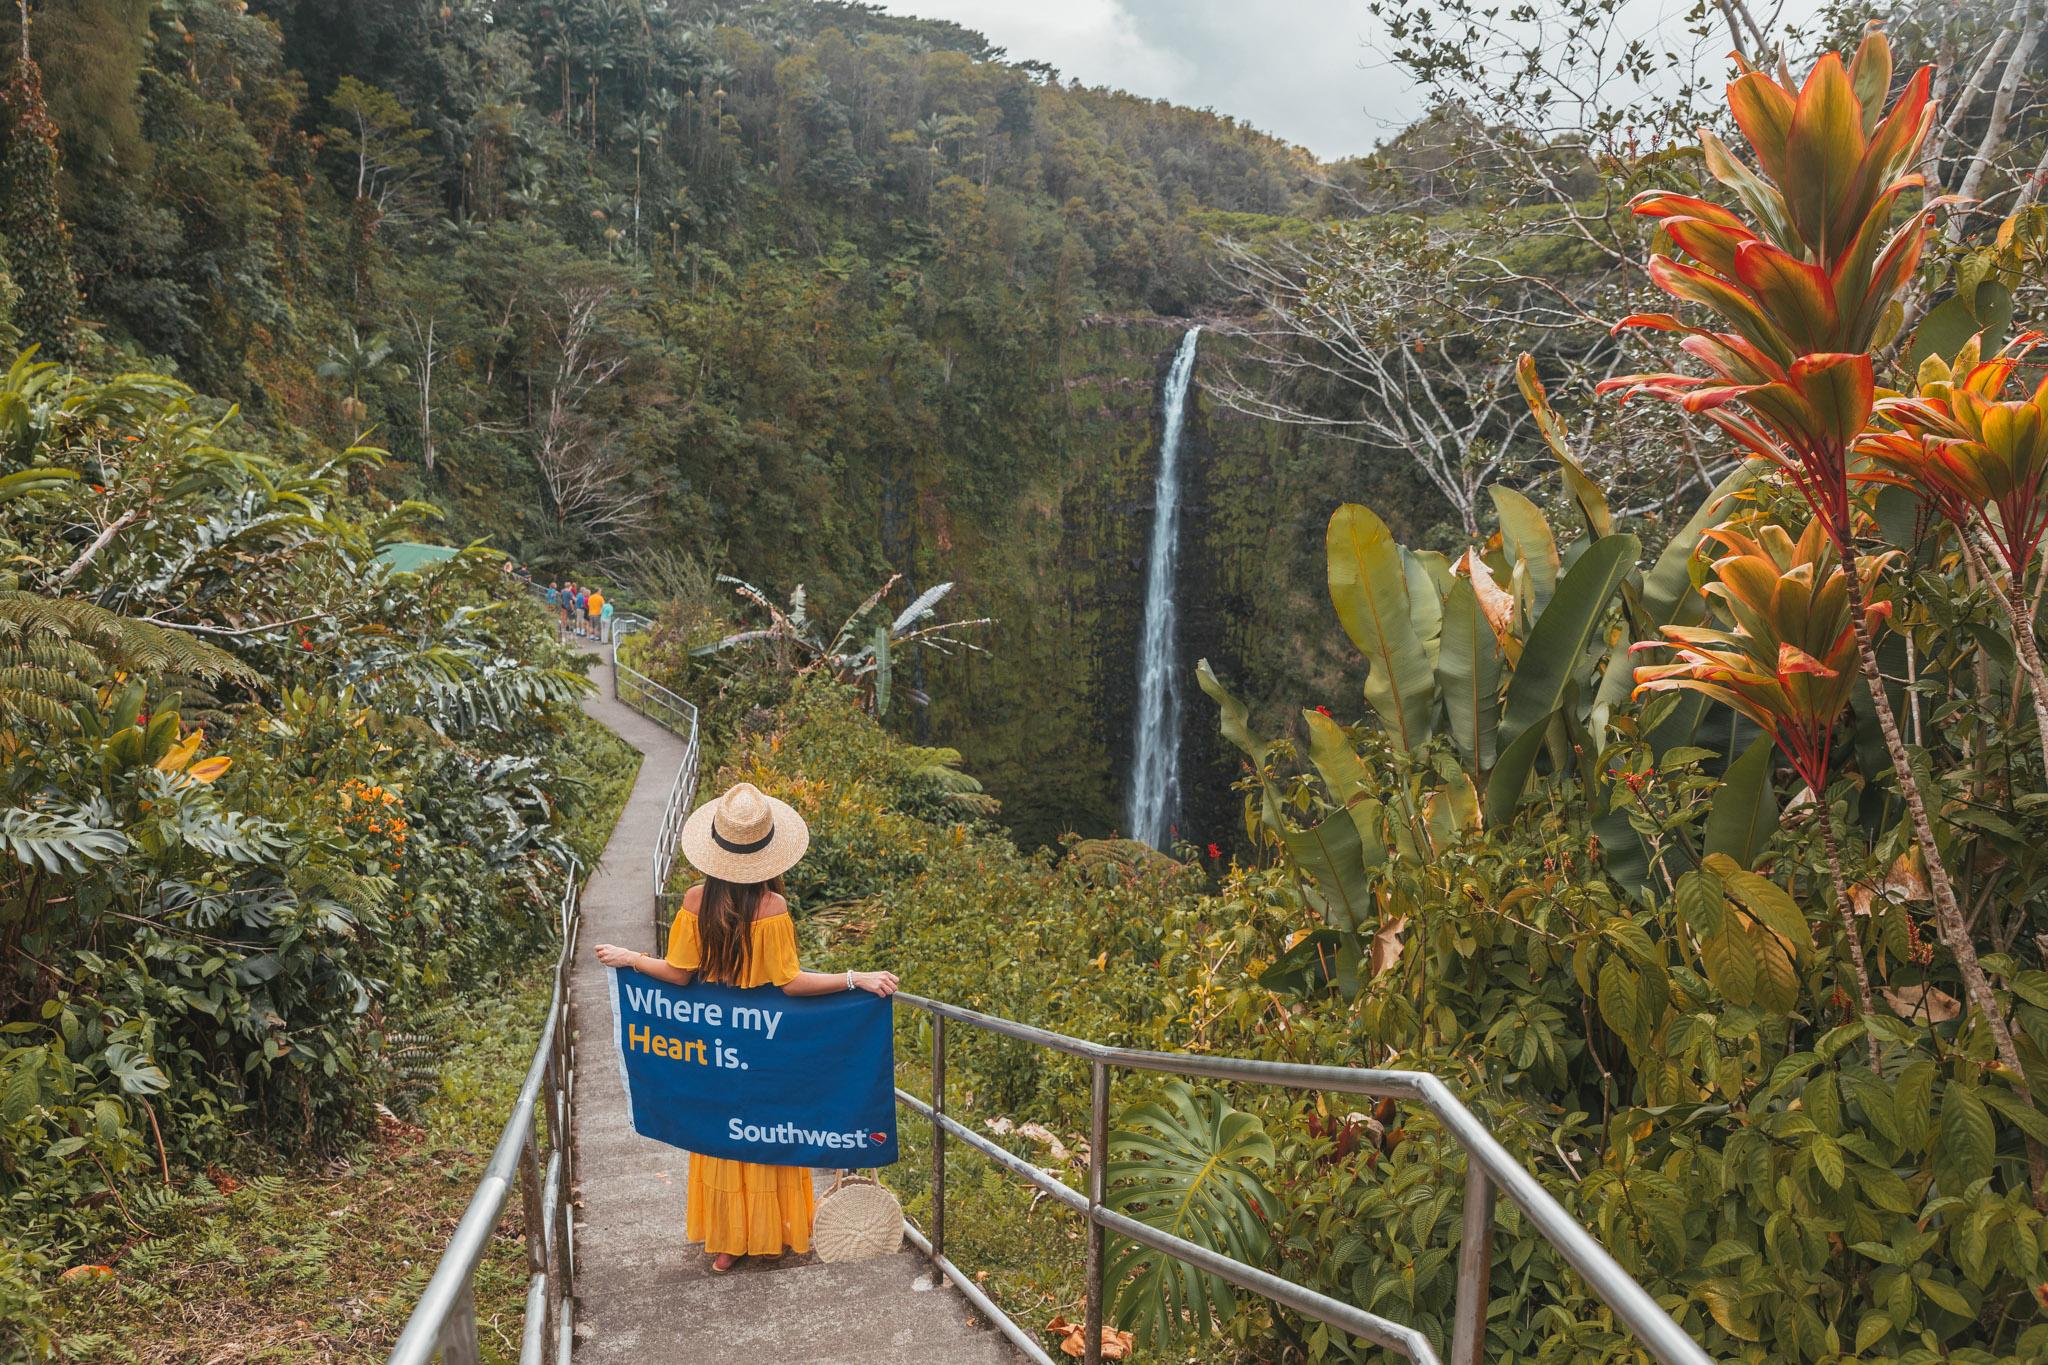 Akaka Falls  // 10 Things You Have to Do on the Big Island of Hawaii // www.readysetjetset.net #readysetjetset #hawaii #bigisland #blogpost #hawaiiguide